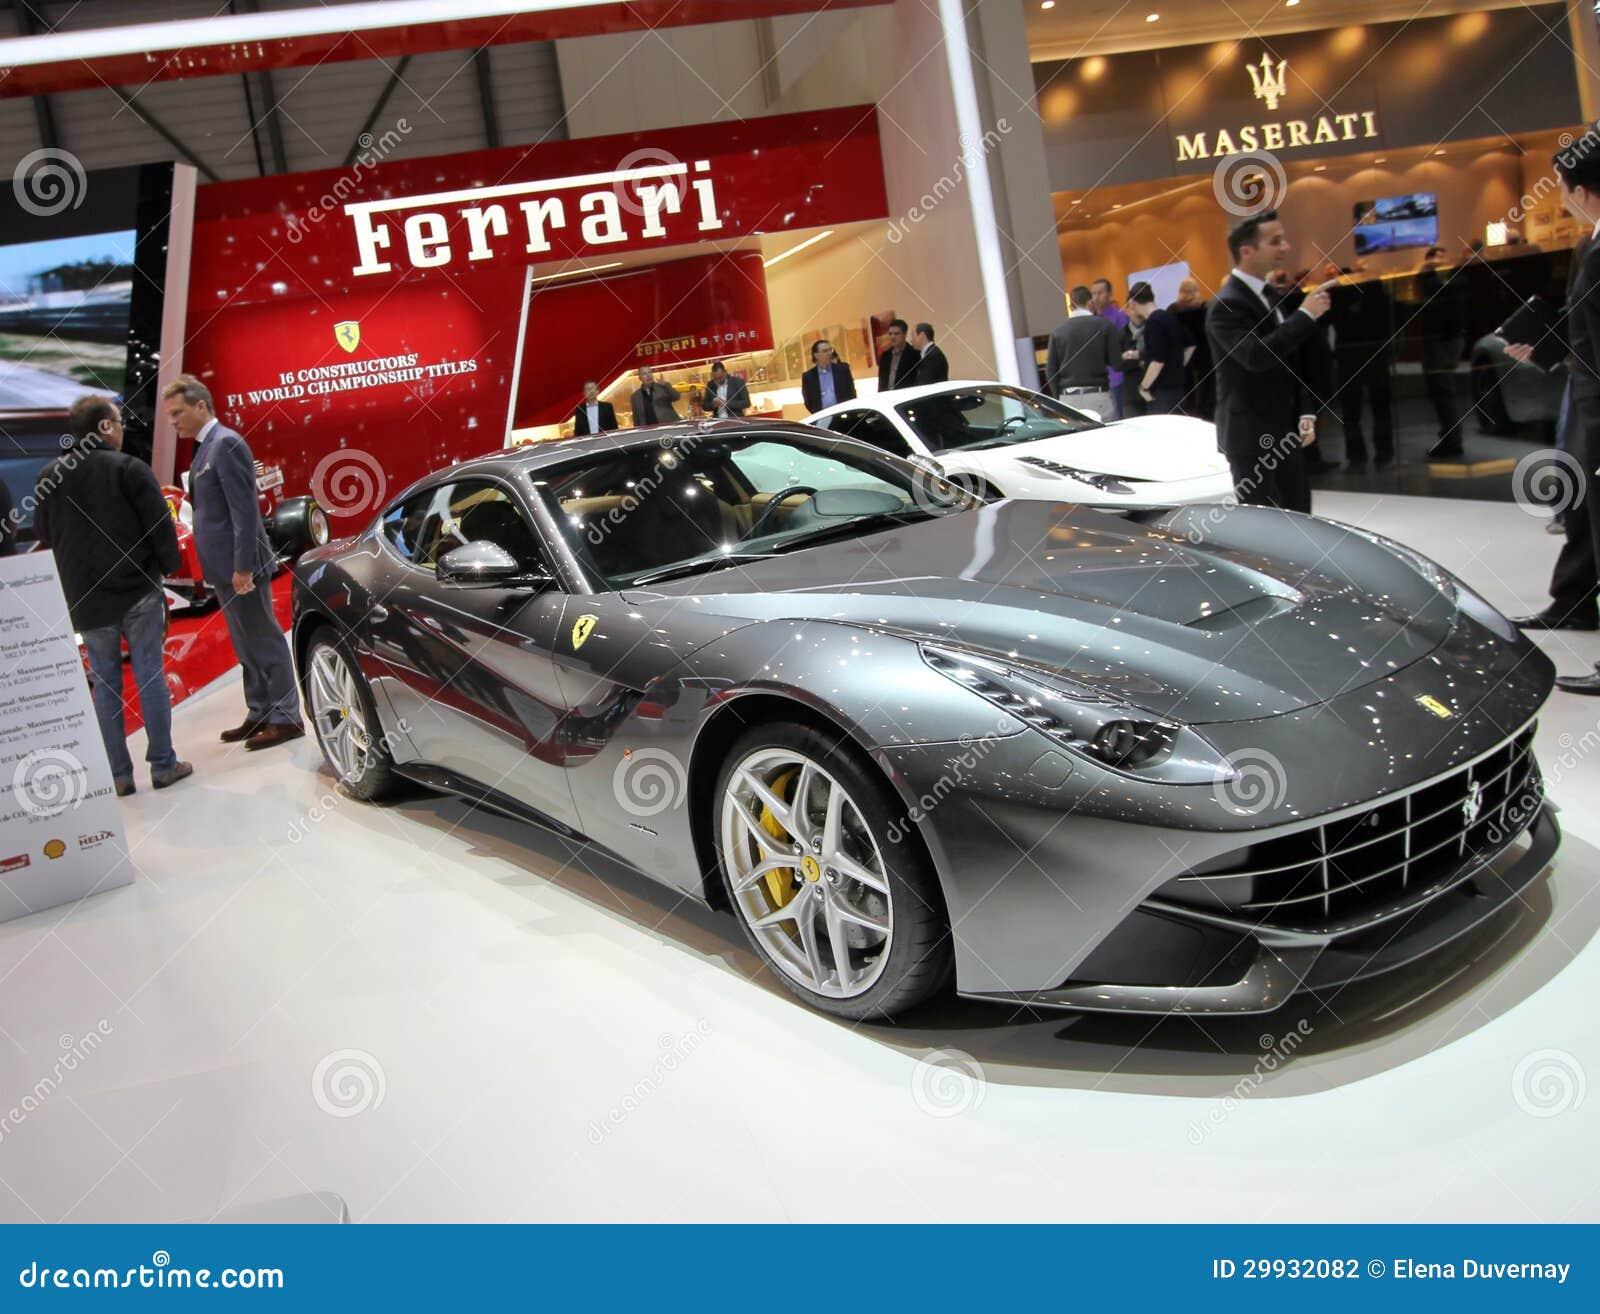 Ferrari F12 Berlinetta Editorial Photography Image 29932082